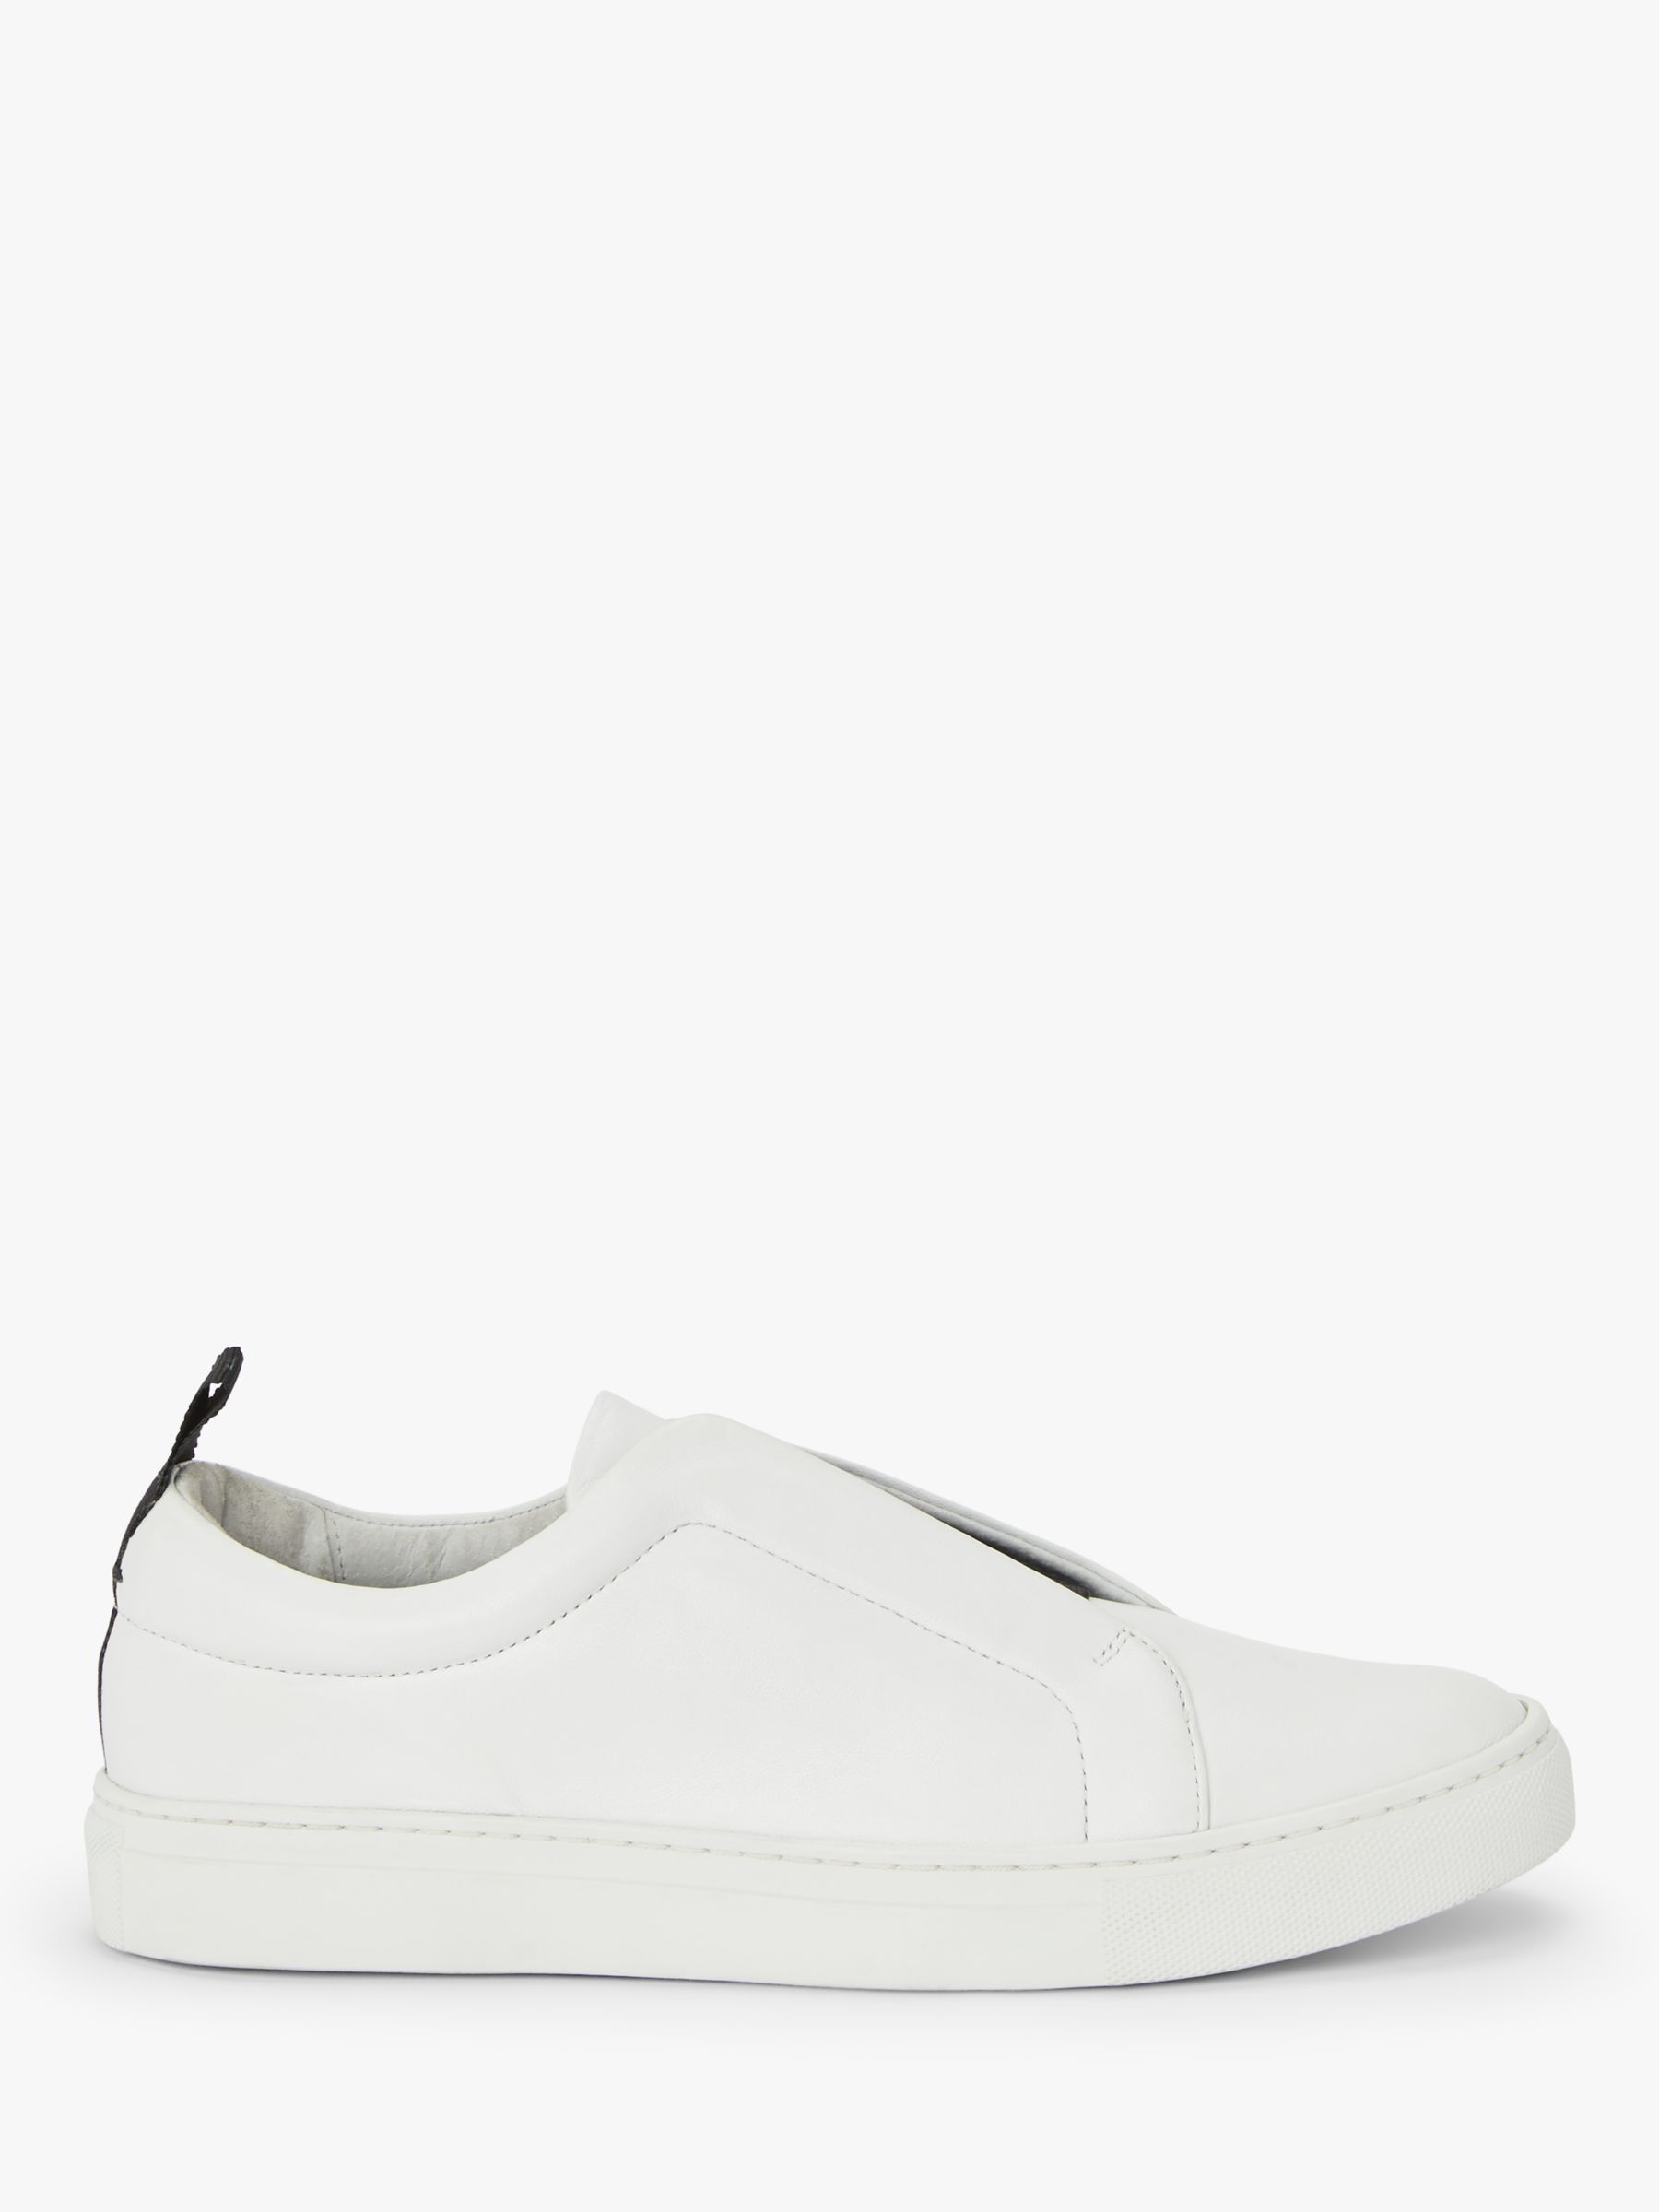 Kin Kin Enni Leather Slip On Trainers, White